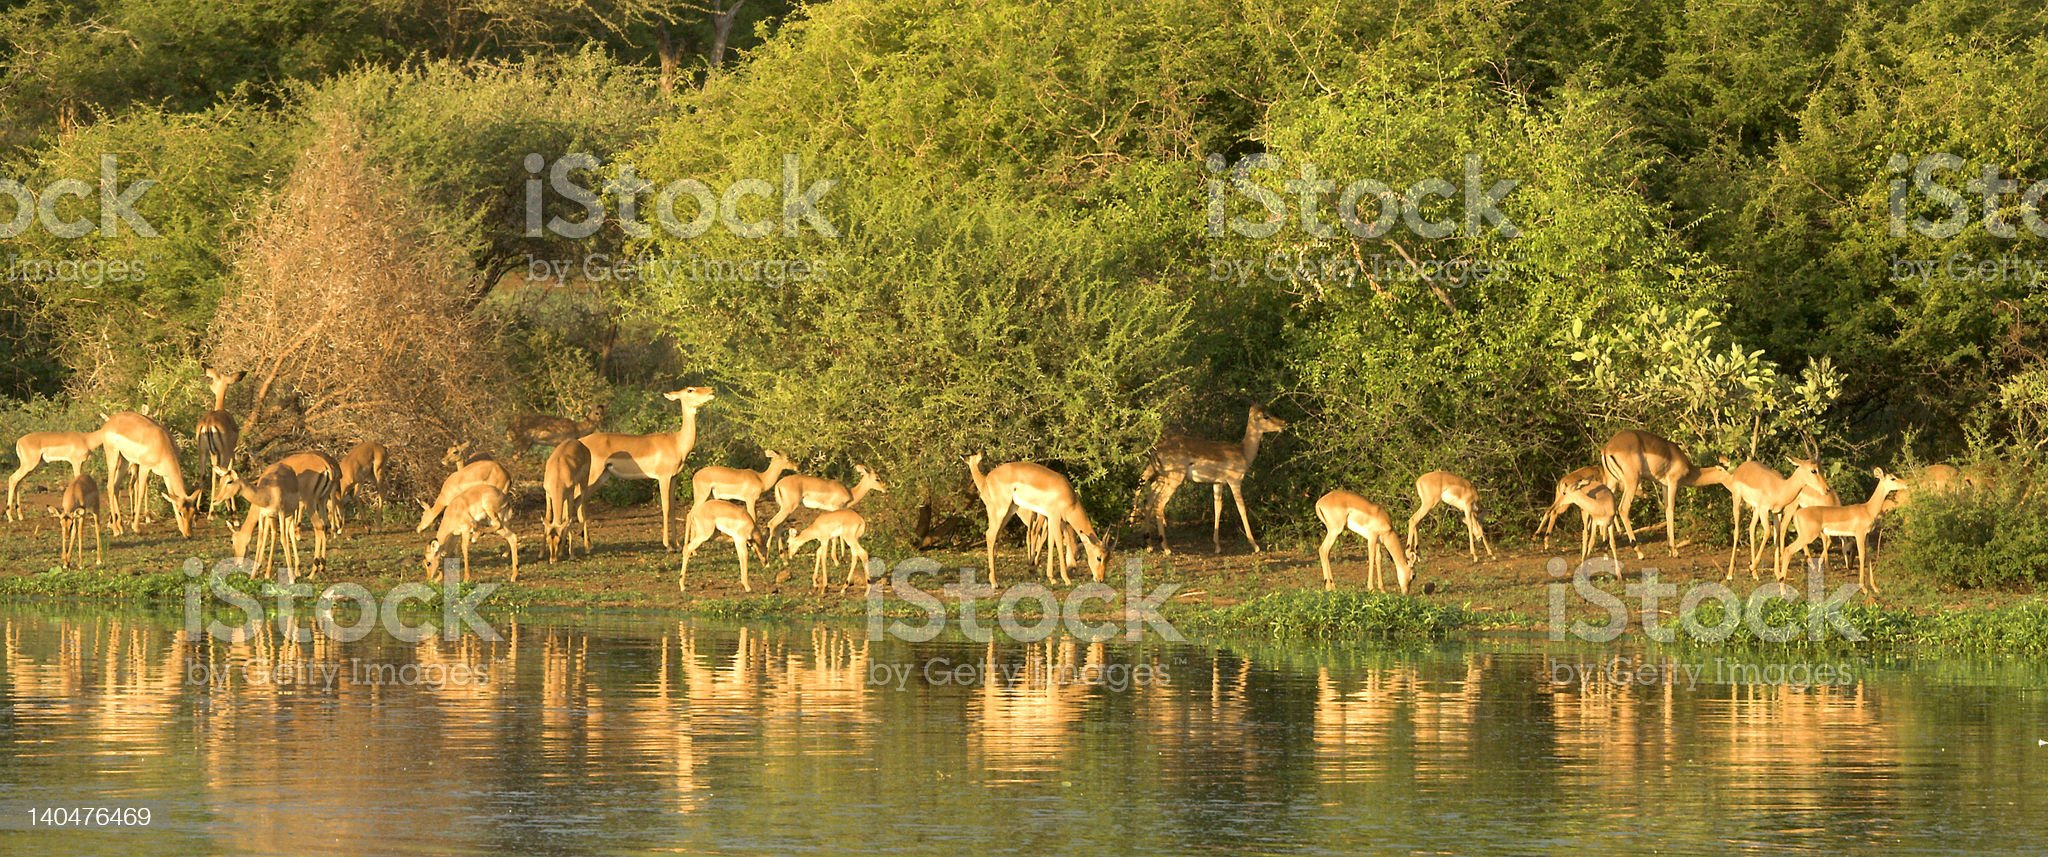 Impala panorama royalty-free stock photo